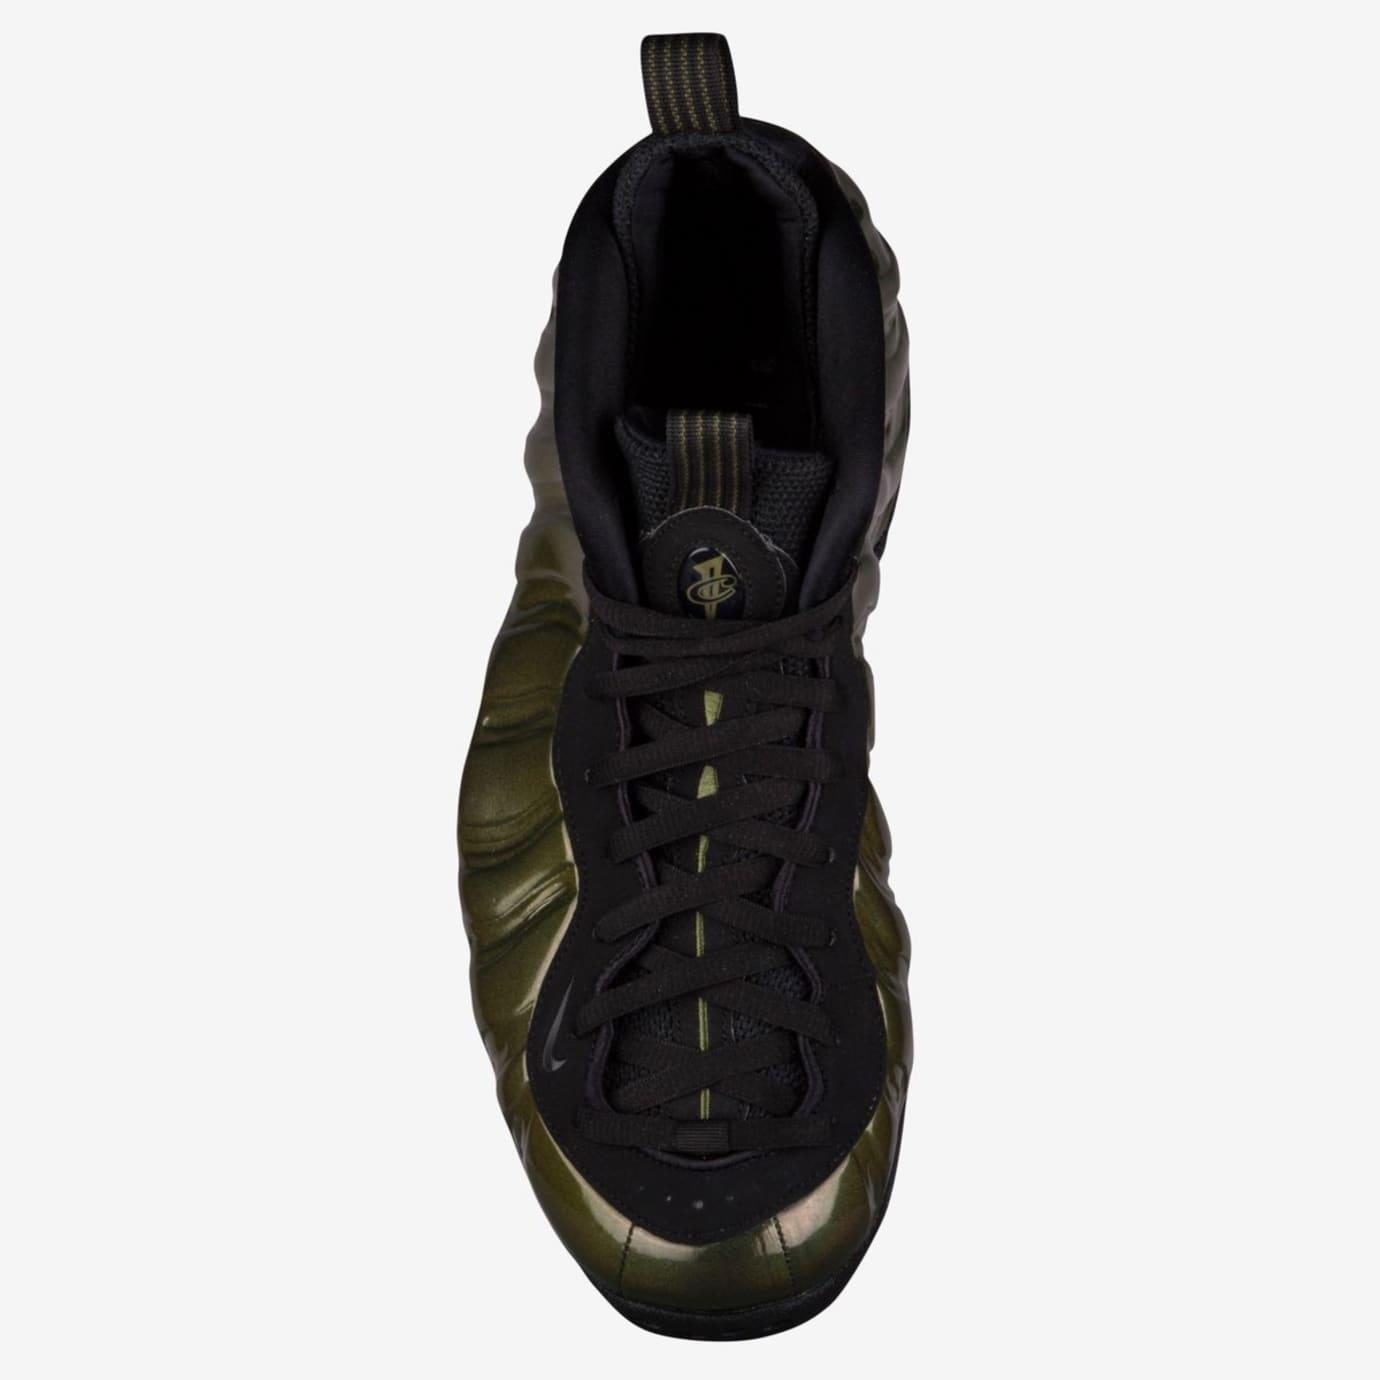 Nike Air Foamposite One 'Legion Green' 314996-301 (Top)